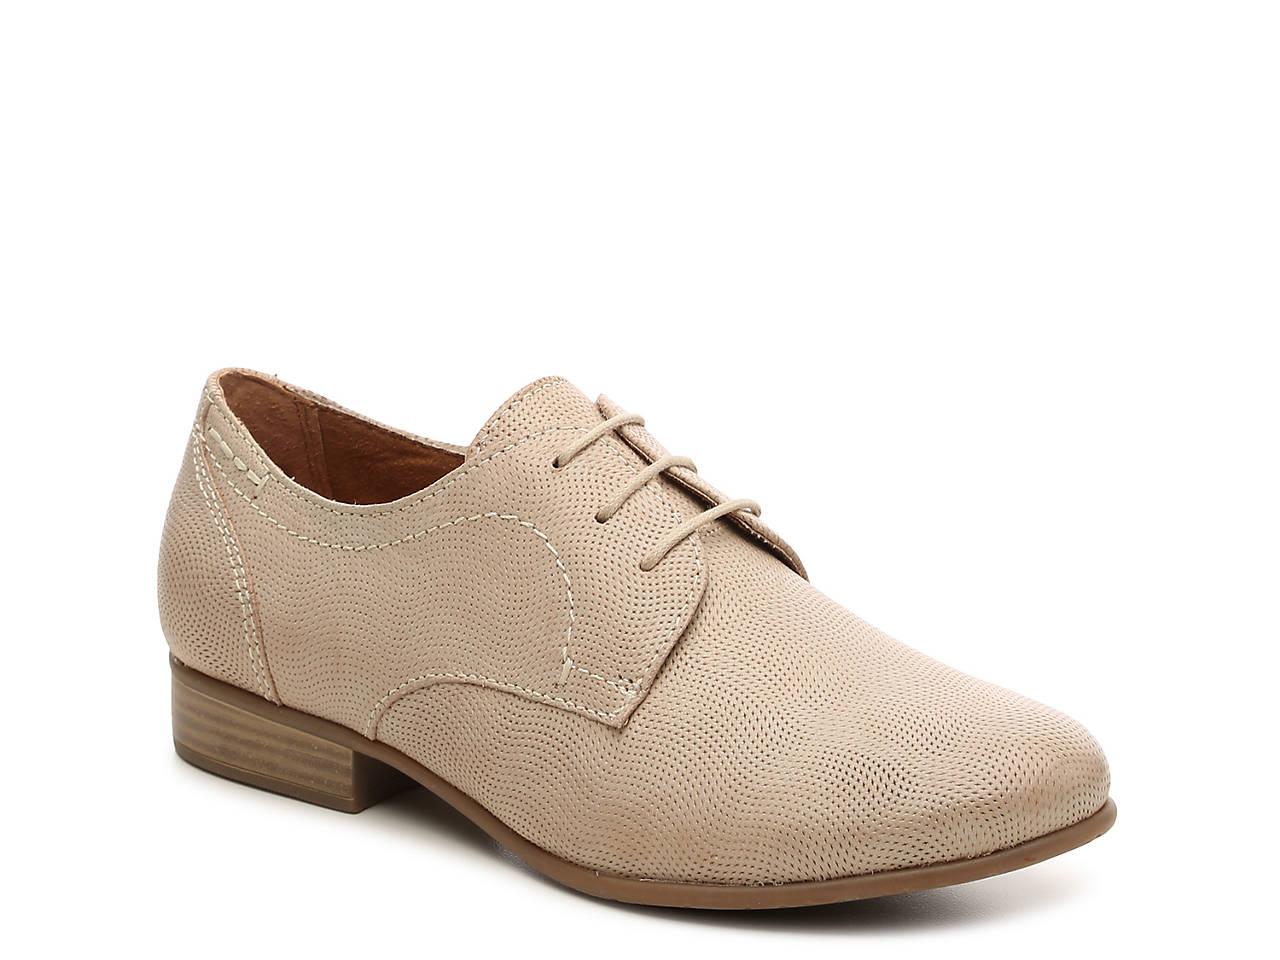 5d30a80ddca35b Tamaris Leather Oxford Women's Shoes | DSW